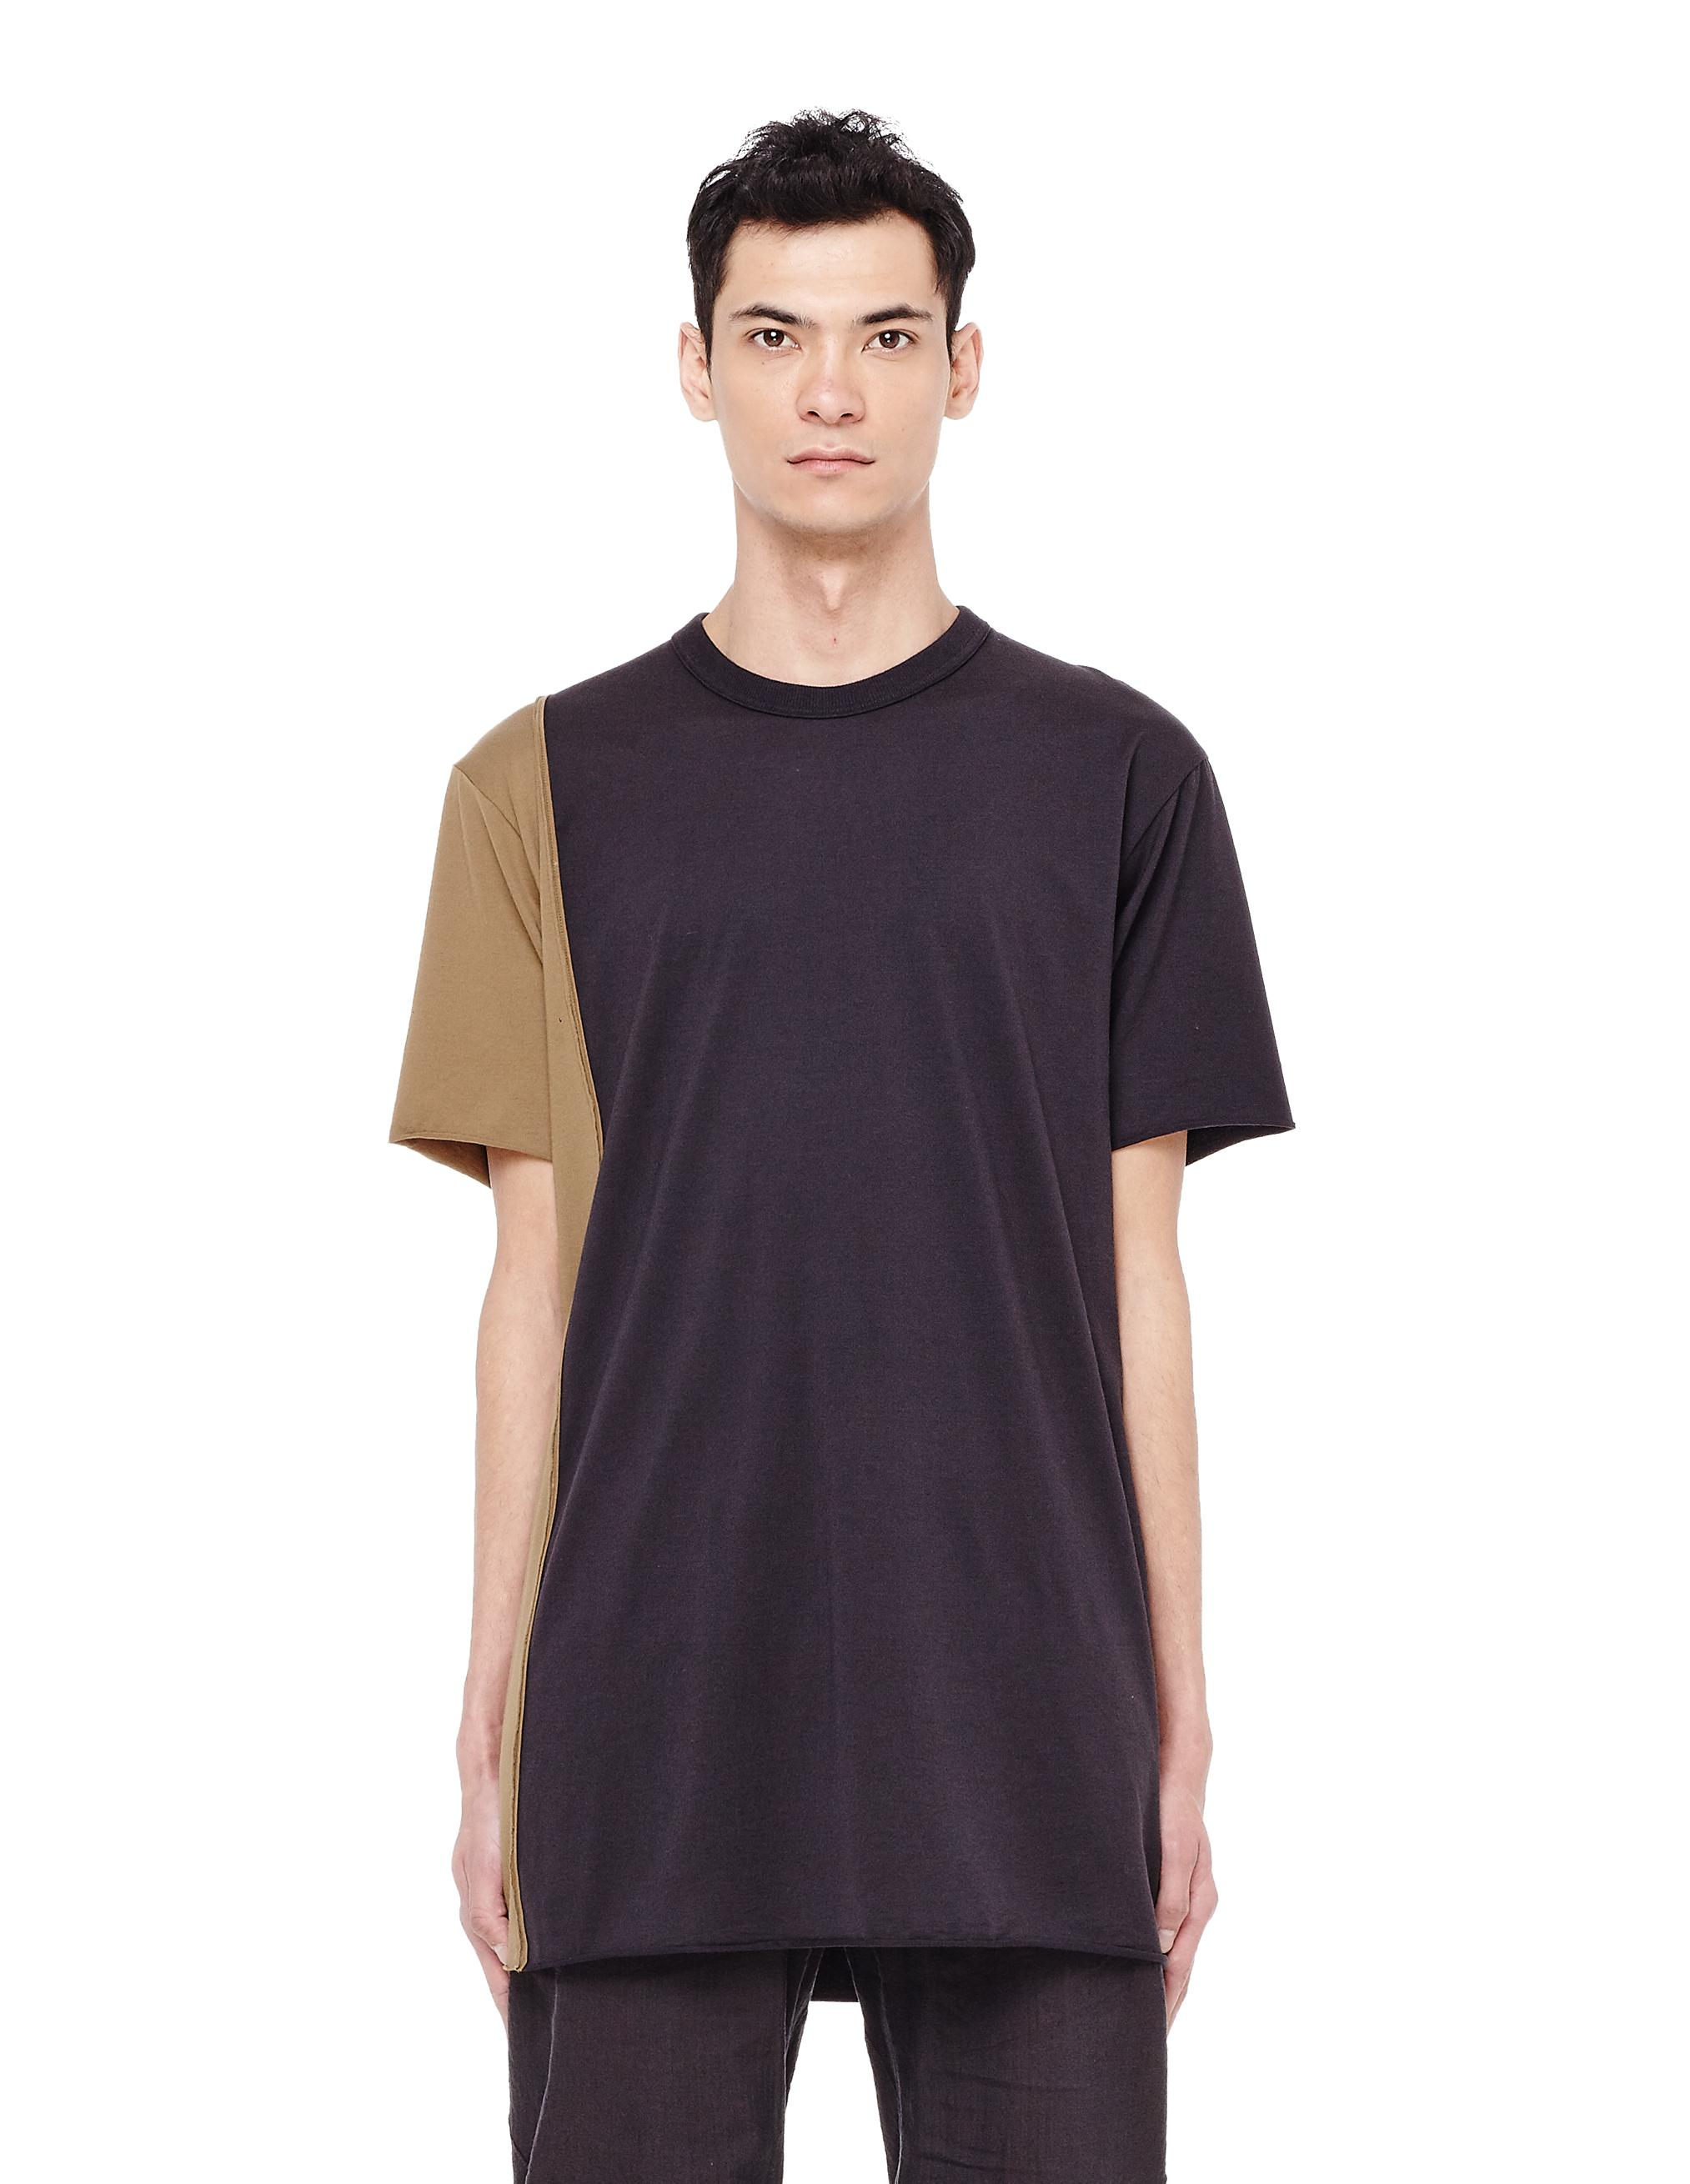 Ziggy Chen Khaki And Black Cotton T-shirt